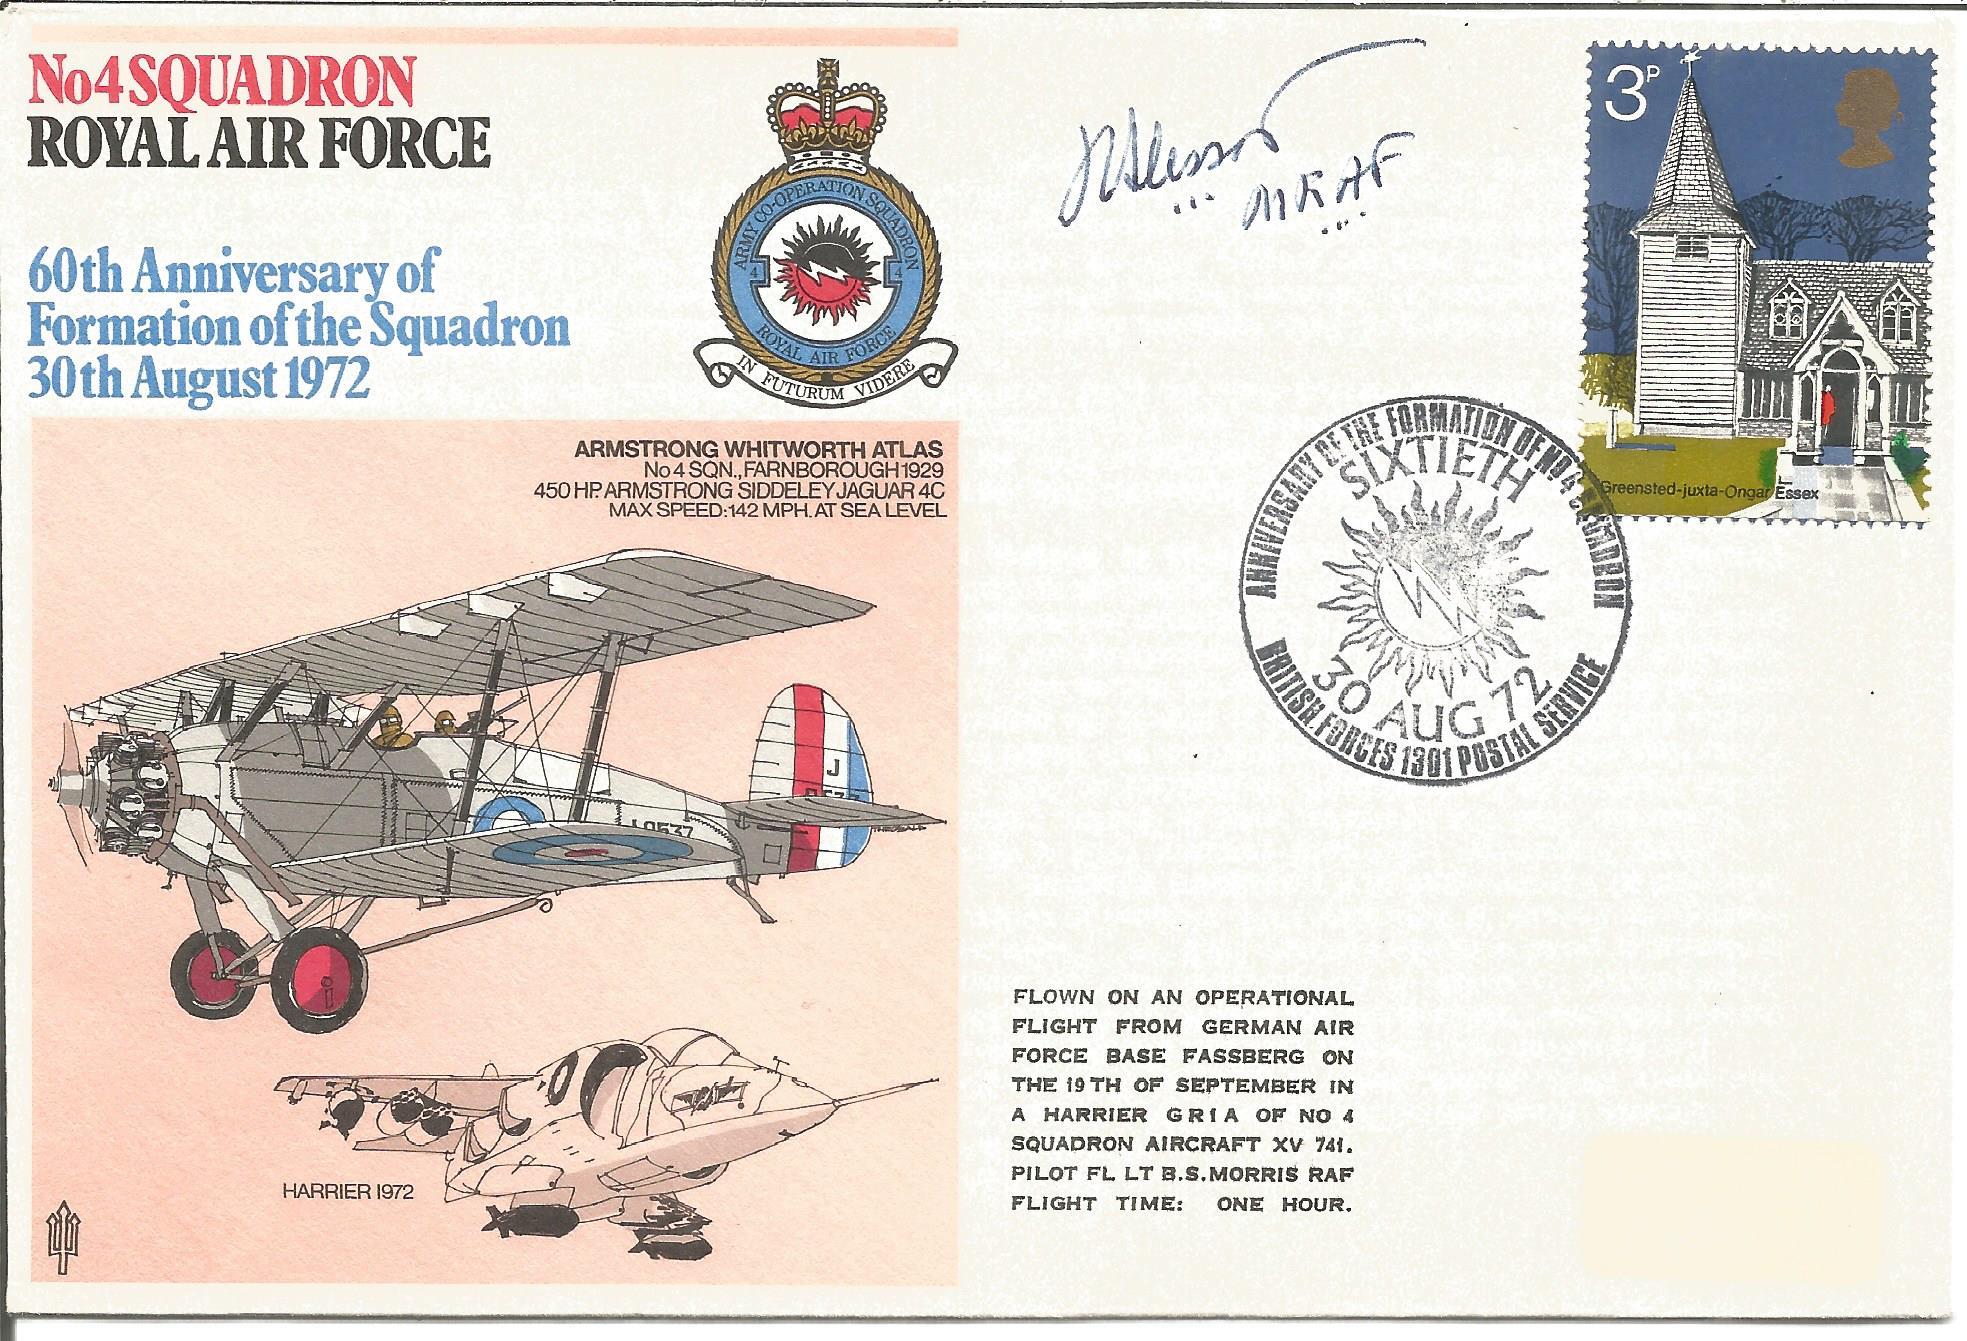 MRAF Slessor RFC WW1 signed No 4 Squadron RAF 60th Anniversary of Formation of the Squadron 30th